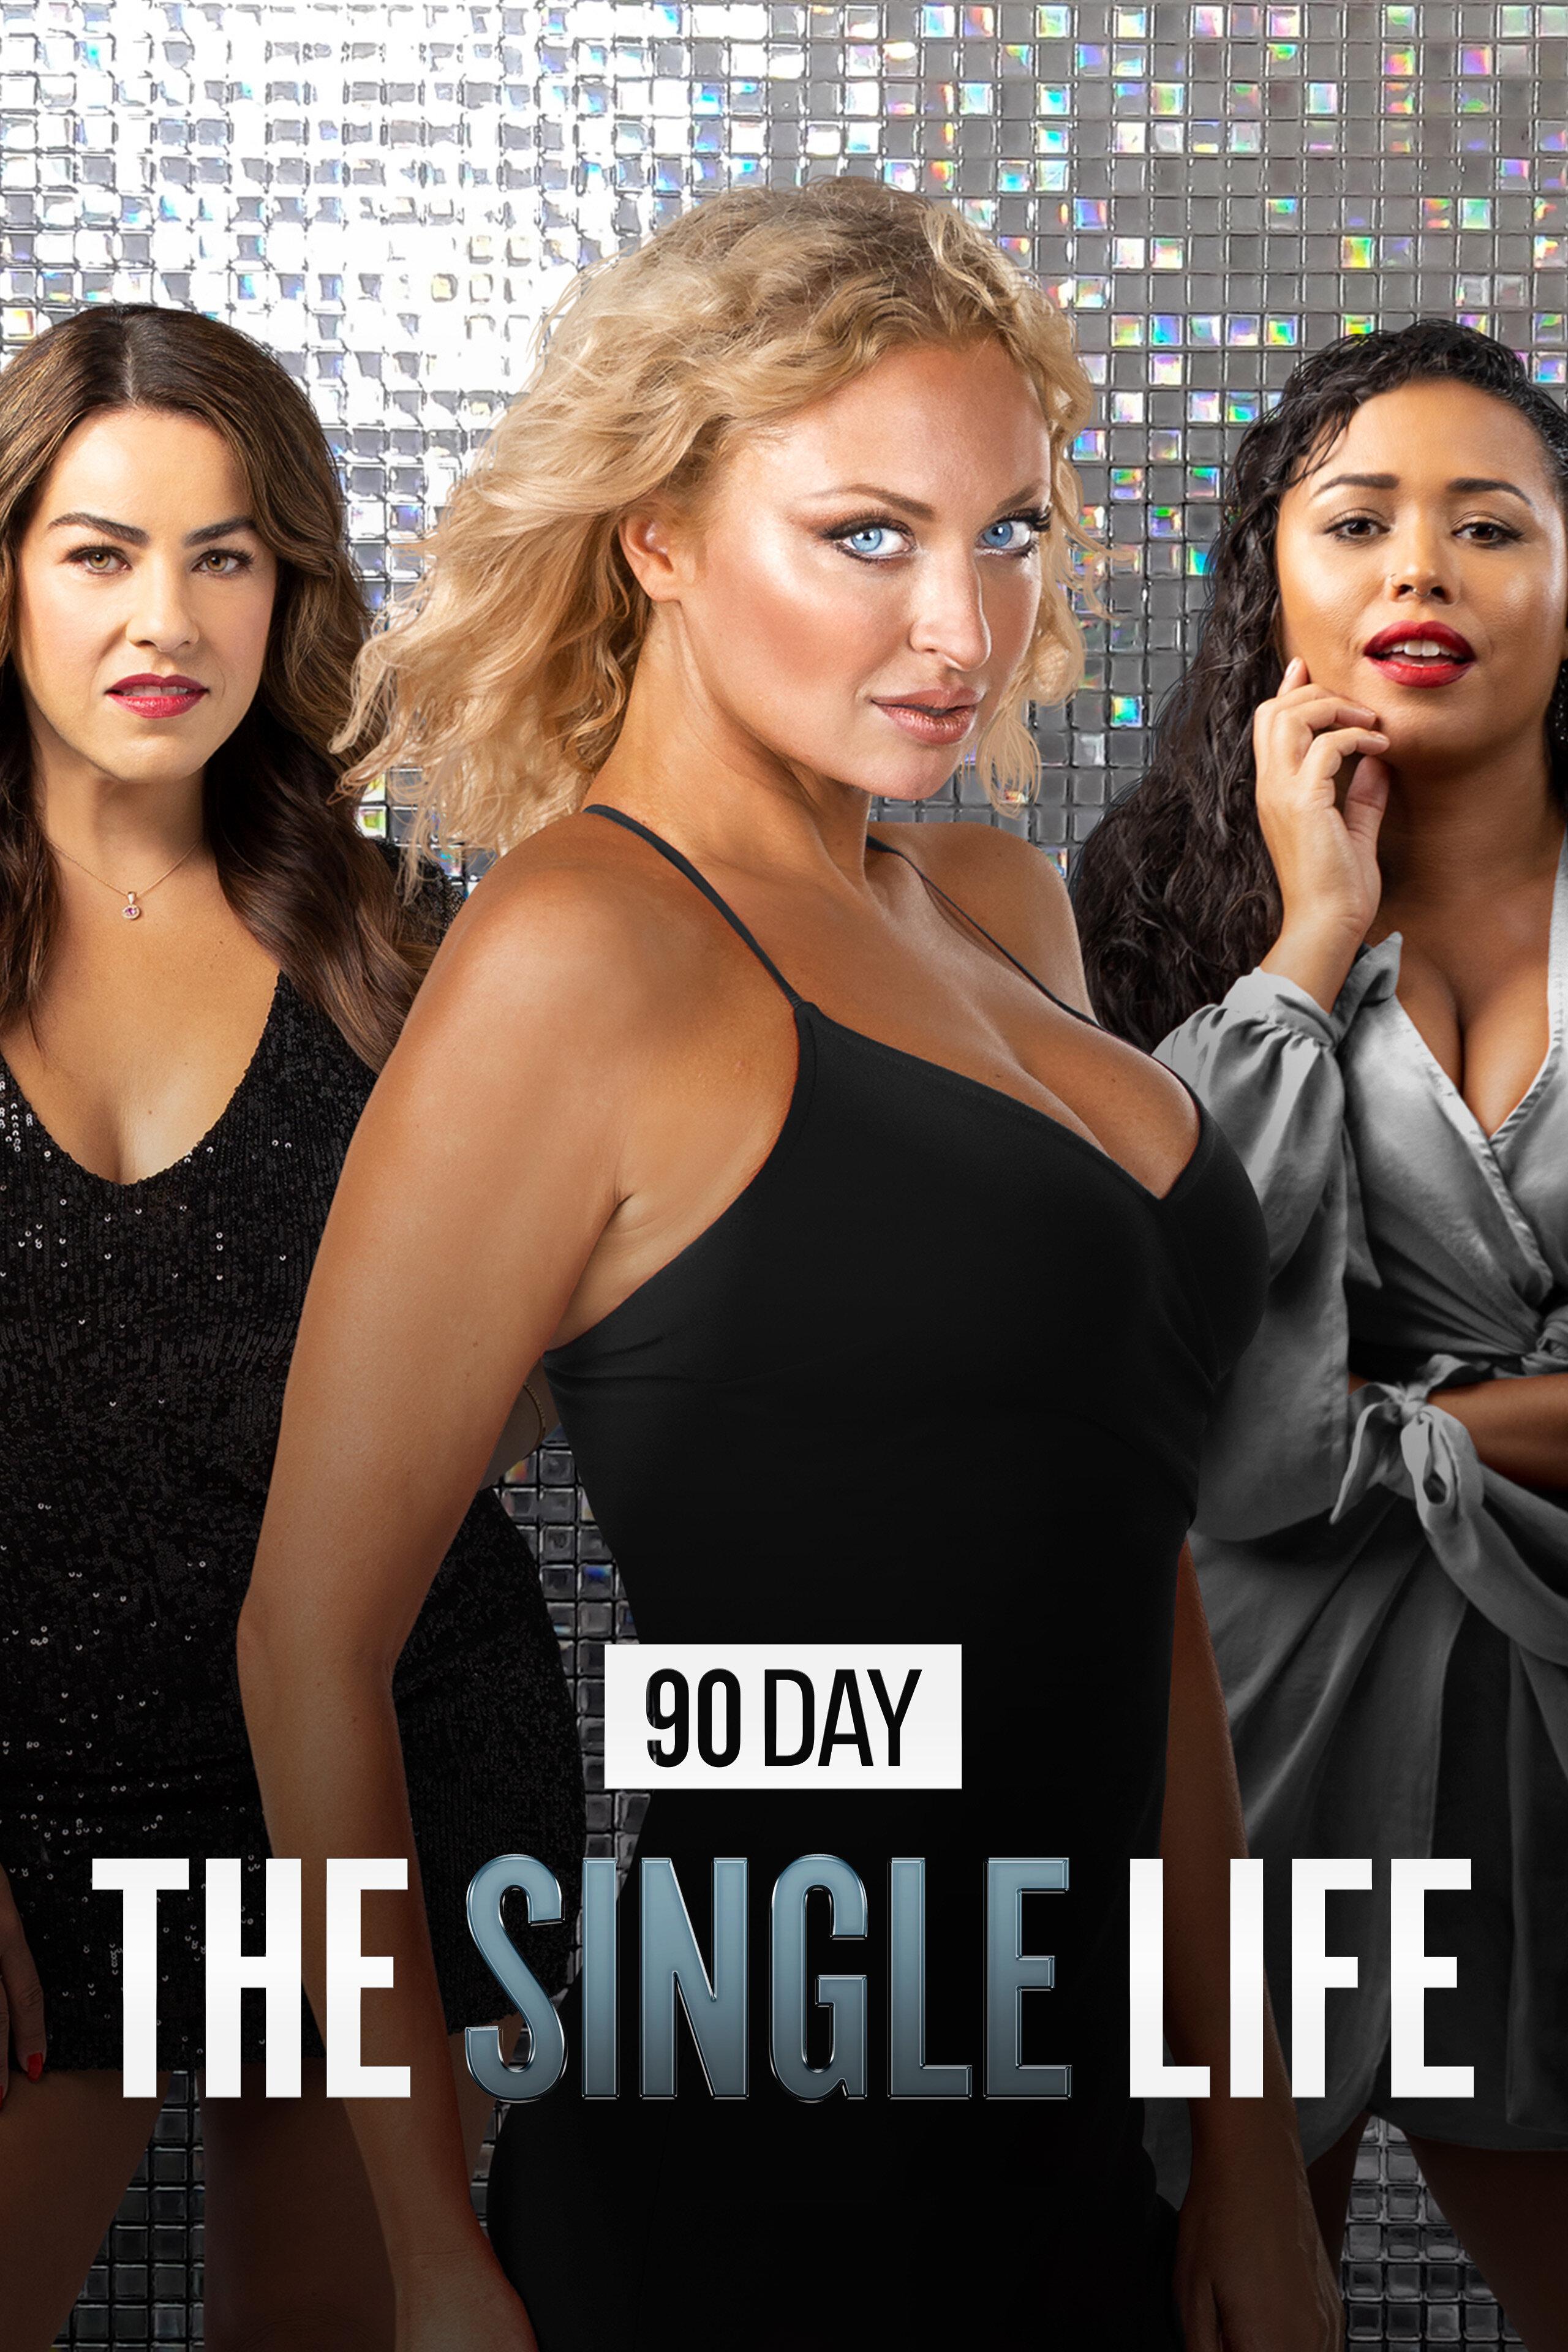 90 Day: The Single Life ne zaman